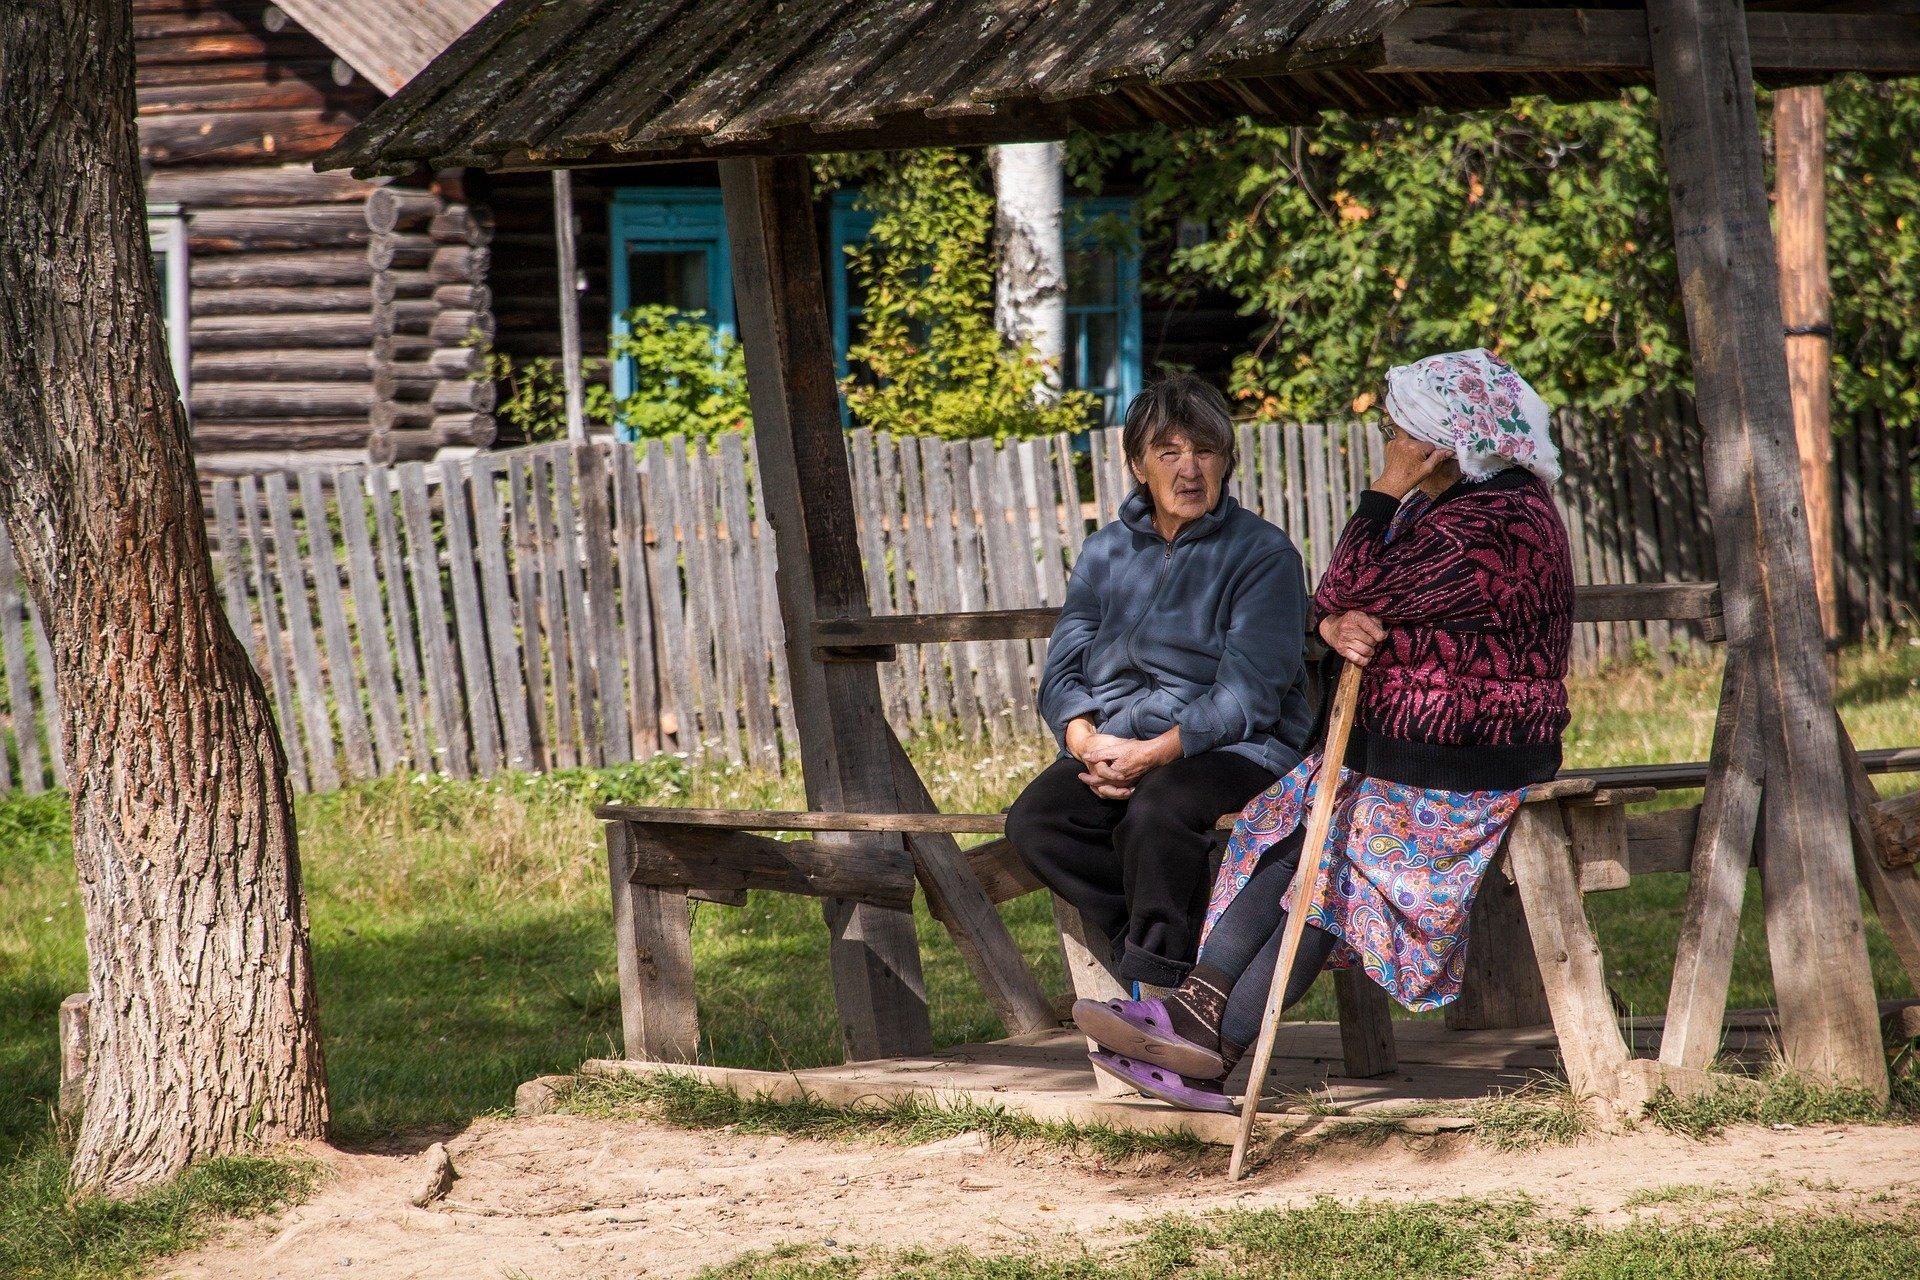 Dos ancianas sentadas en un banco. | Fuente: Anton Gorshunov / Pixabay